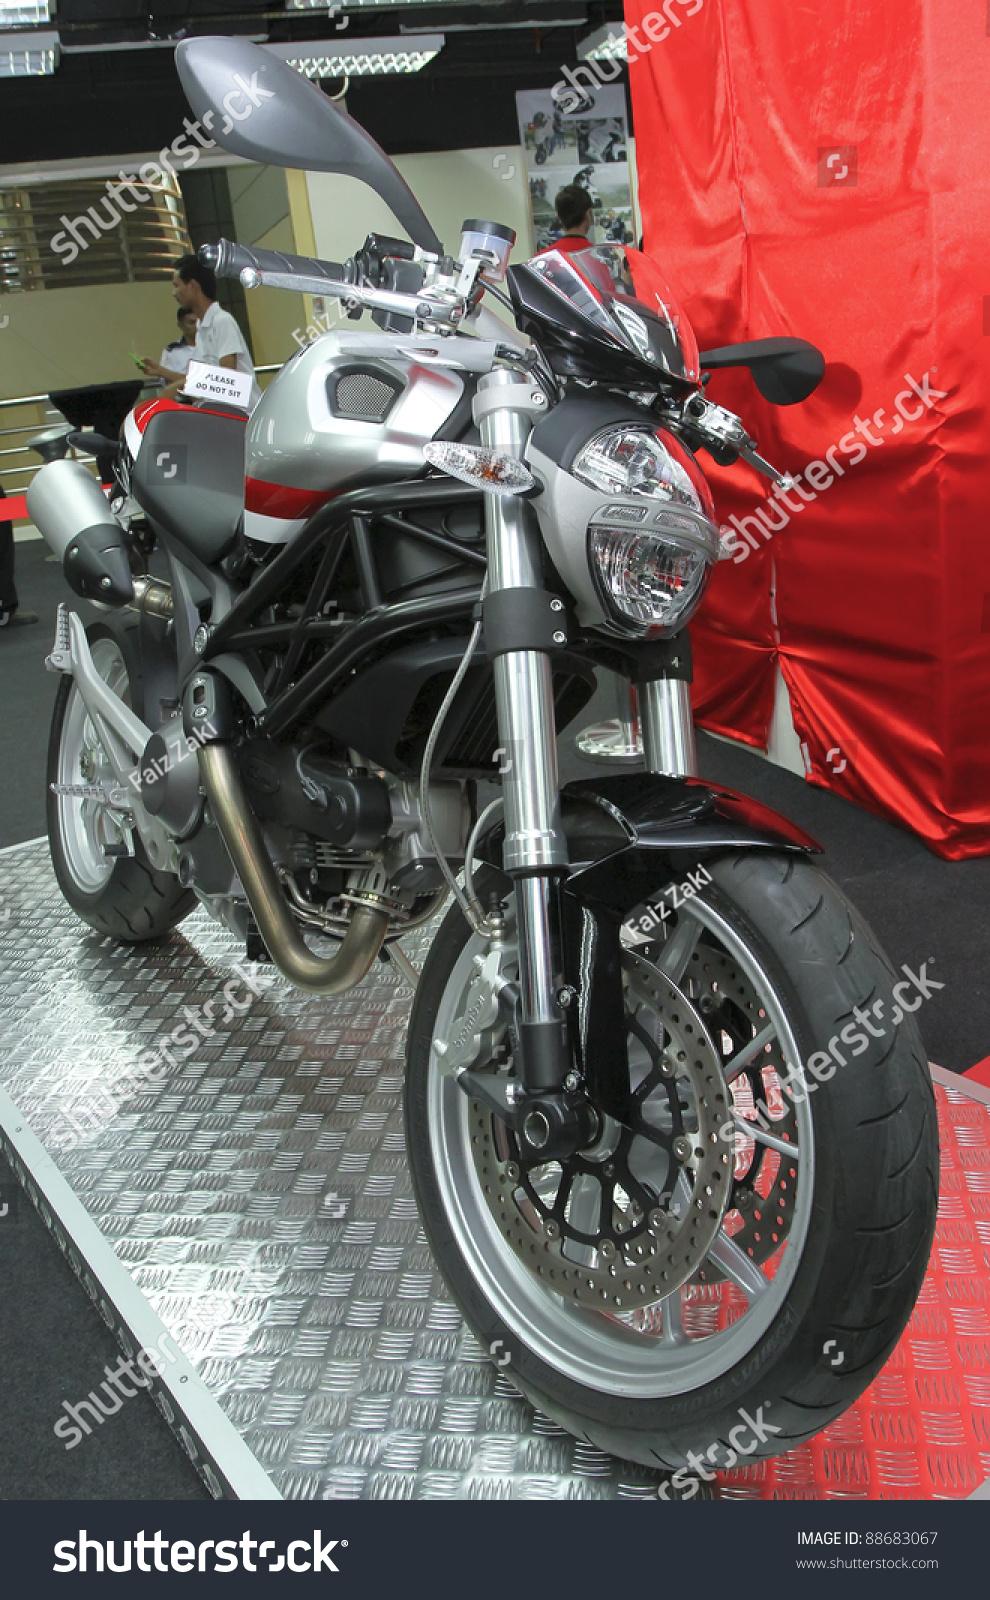 Kuala Lumpur Nov 12 Ducati Monster Stock Photo Edit Now 88683067